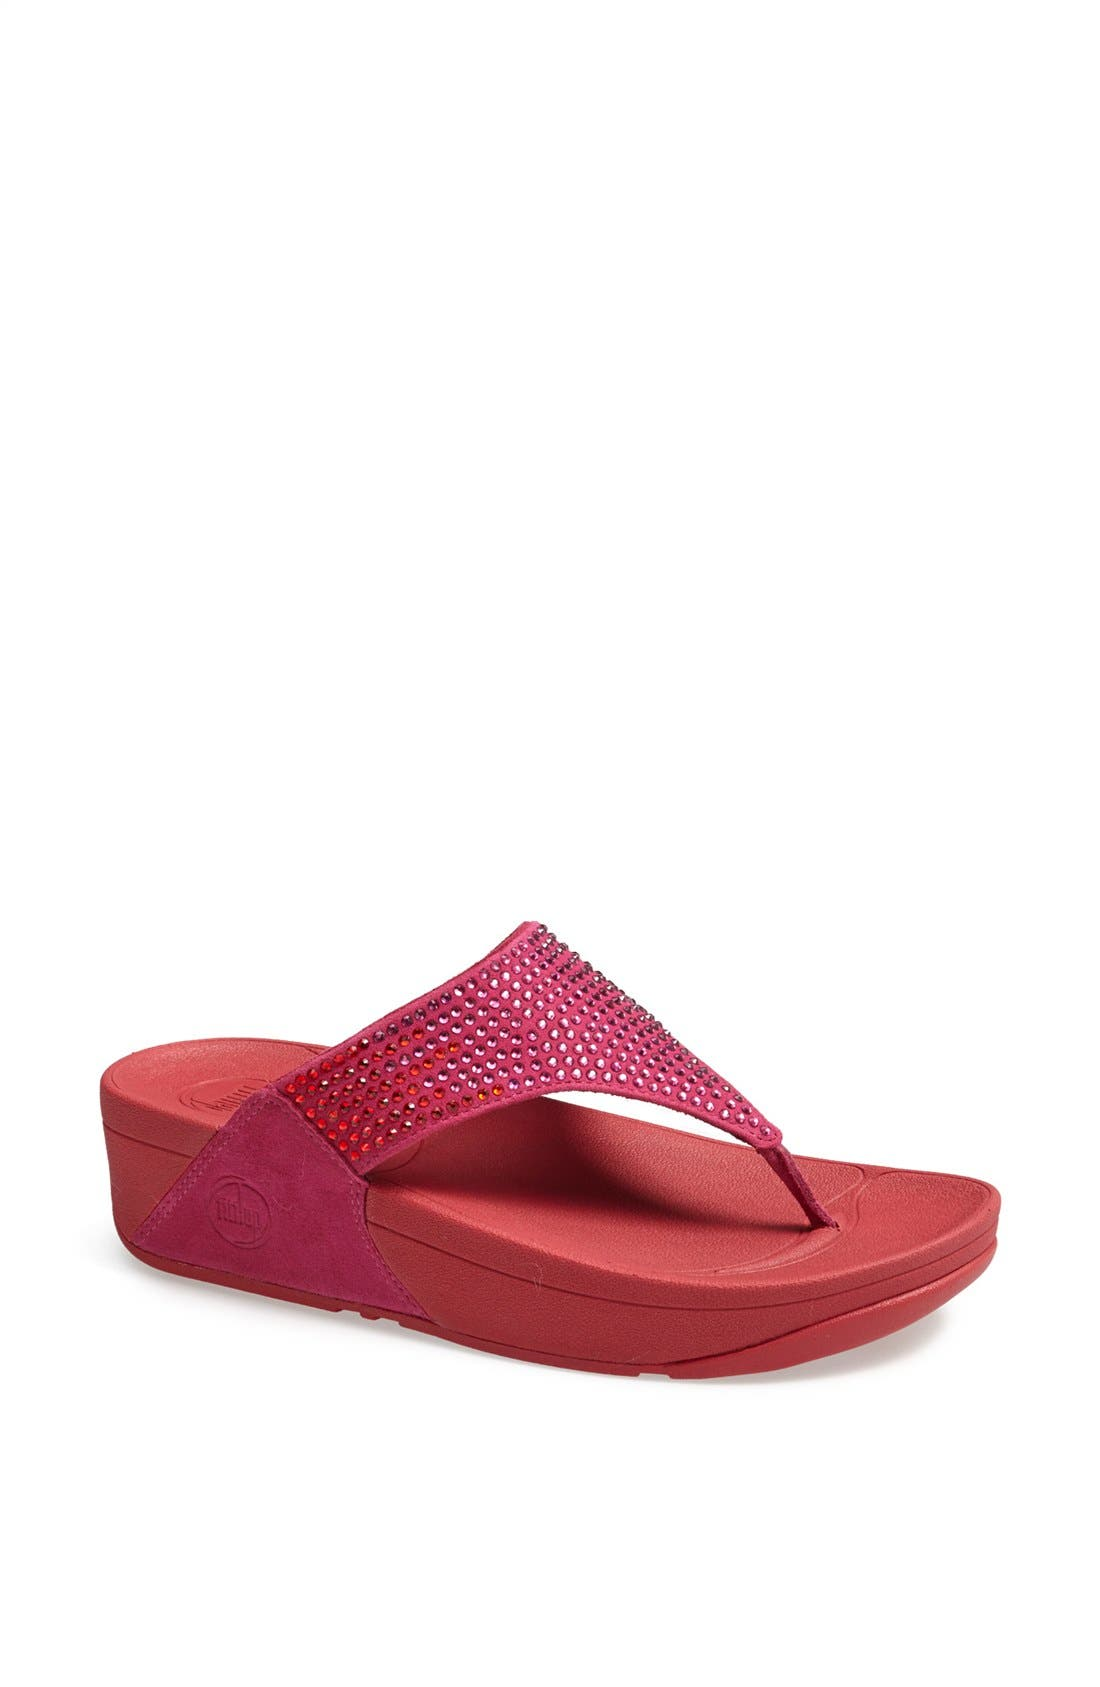 Alternate Image 1 Selected - FitFlop 'Flare™' Sandal